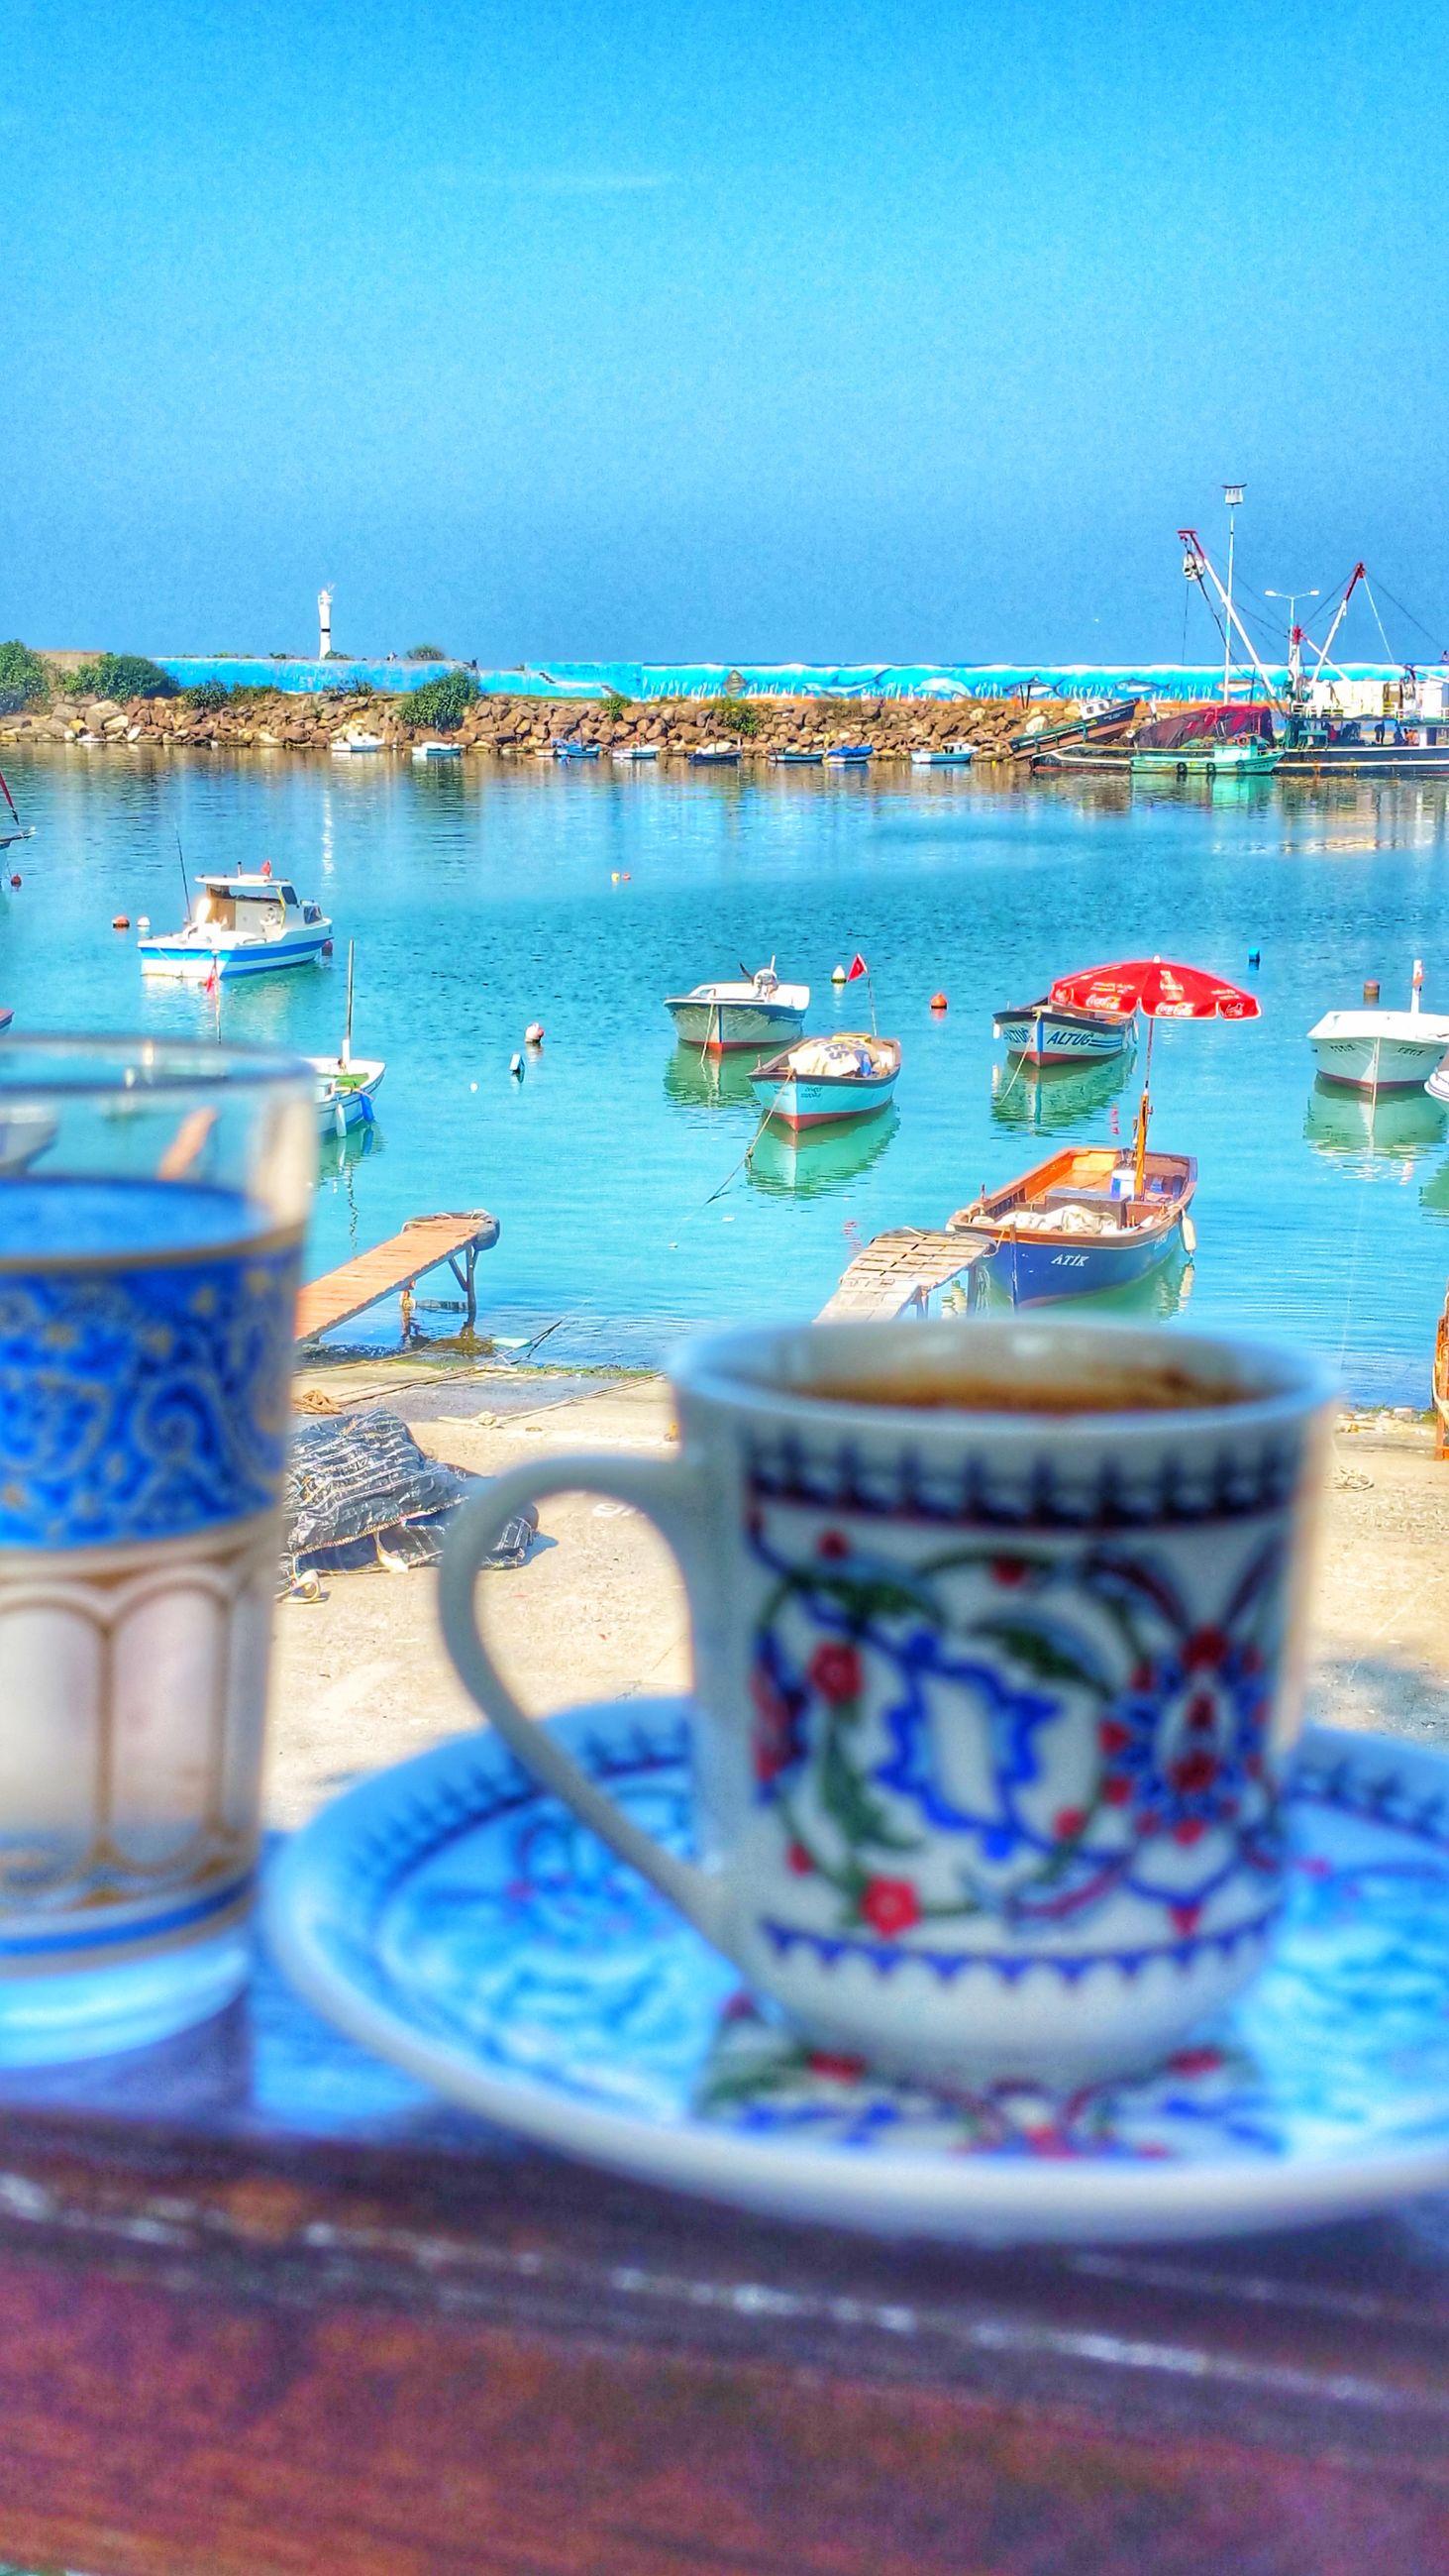 nautical vessel, transportation, water, mode of transport, blue, marina, day